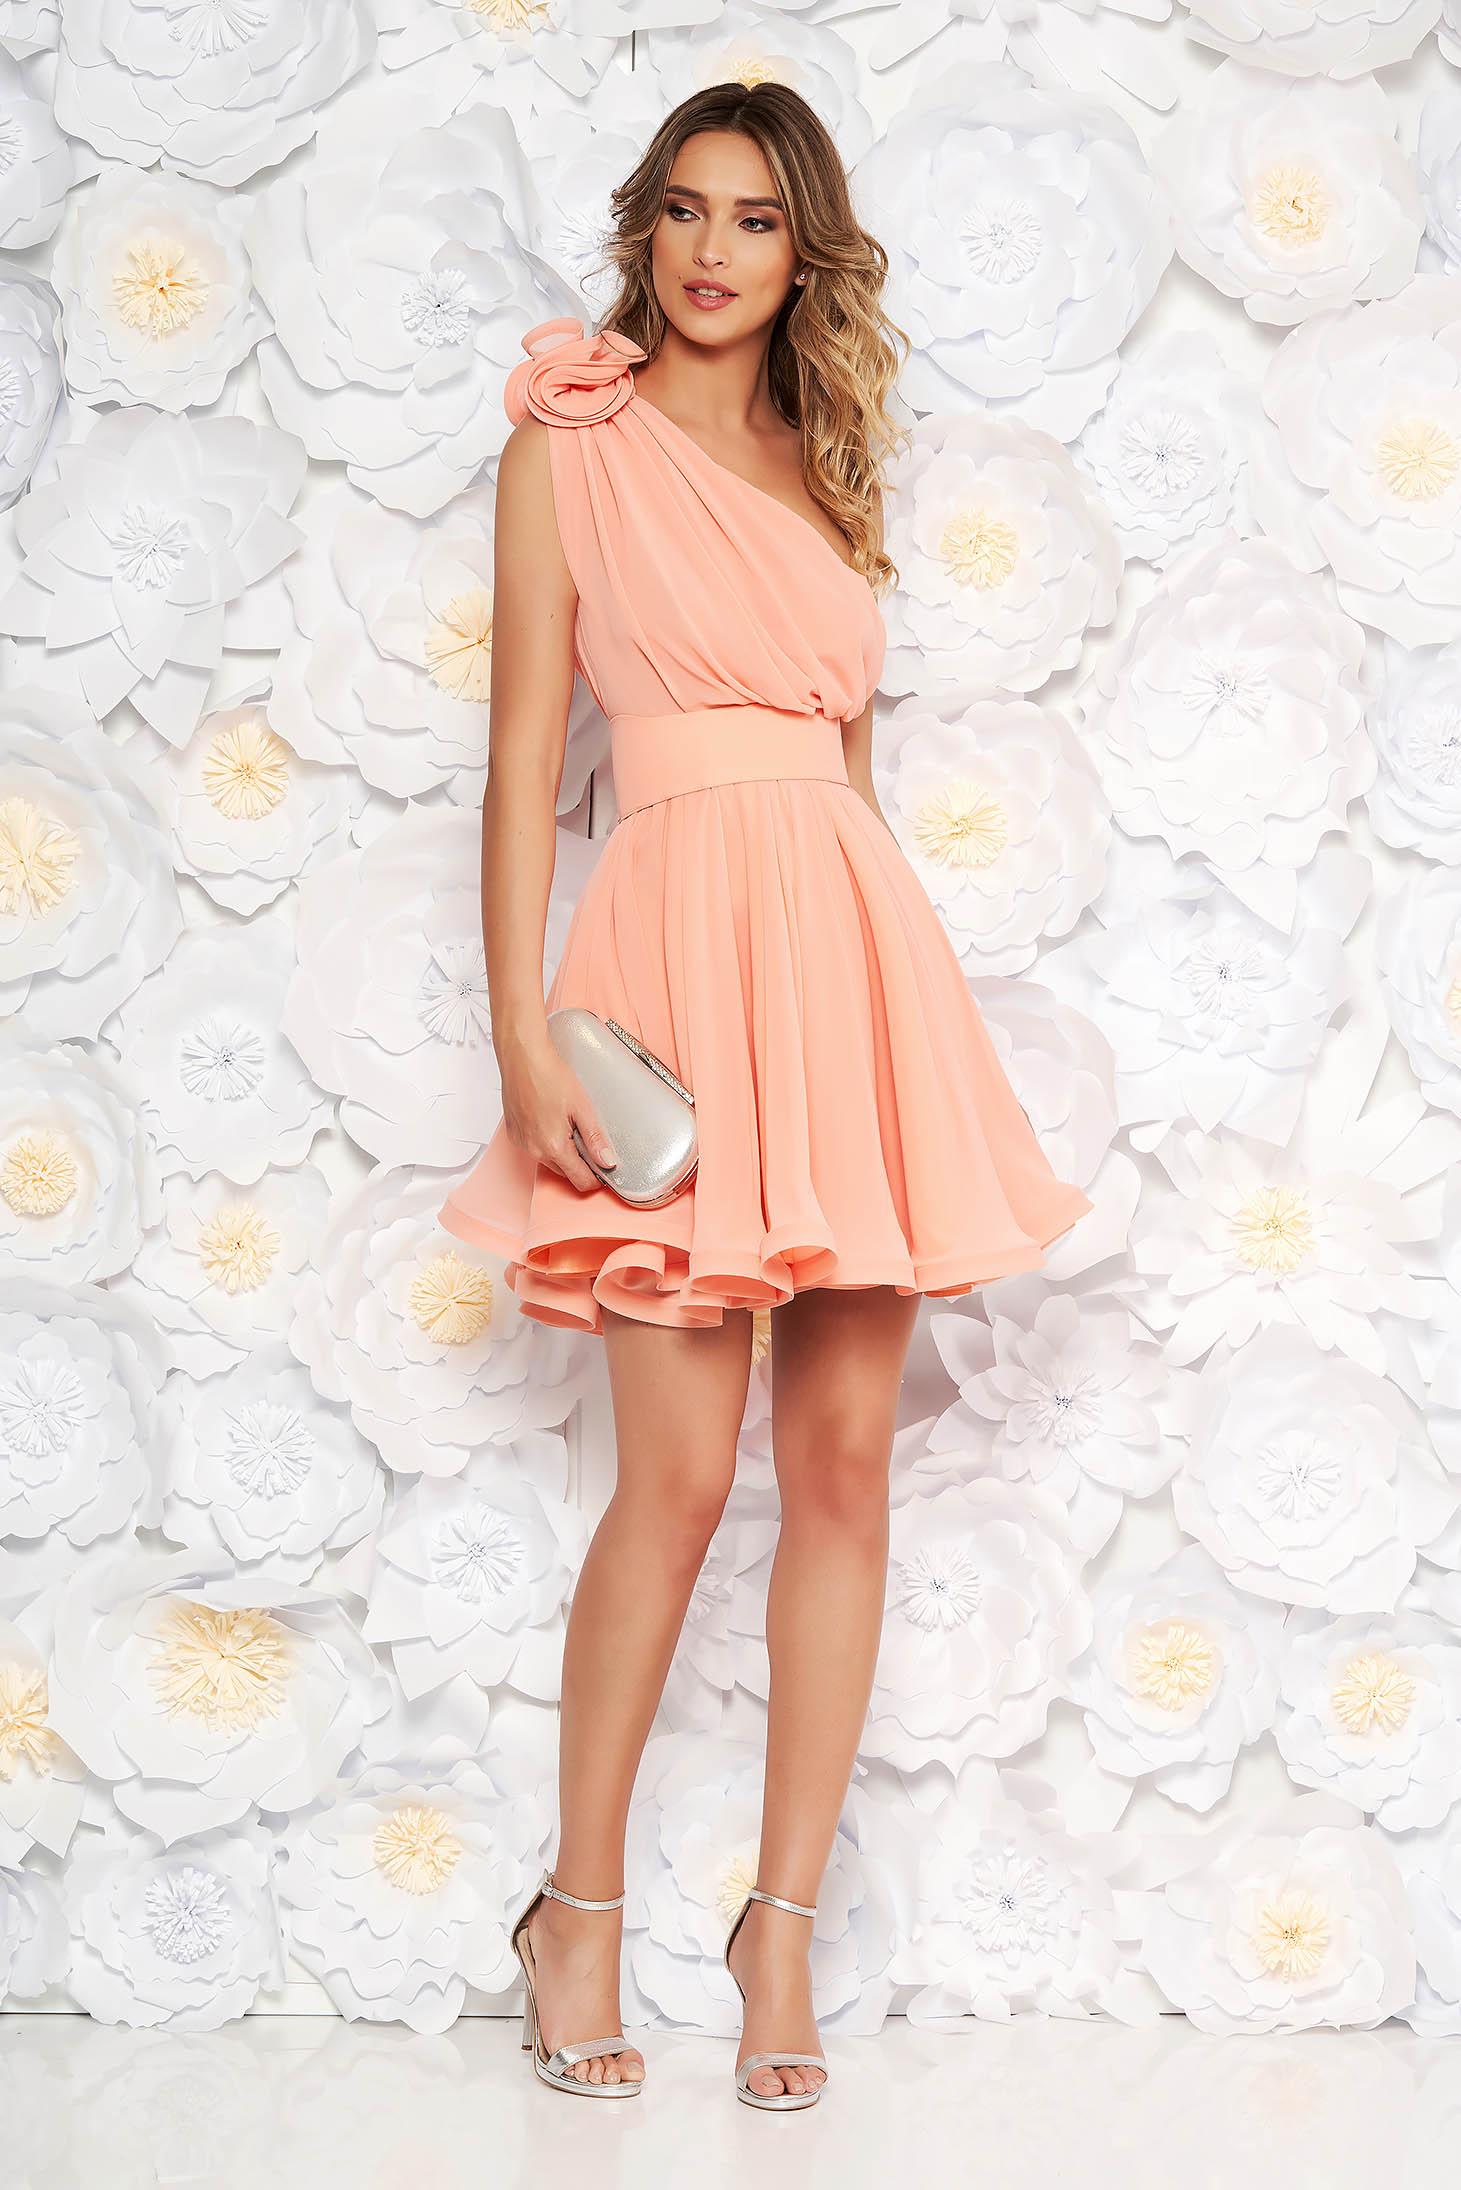 Ana Radu luxurious peach dress from veil fabric with inside lining cloche accessorized with tied waistband